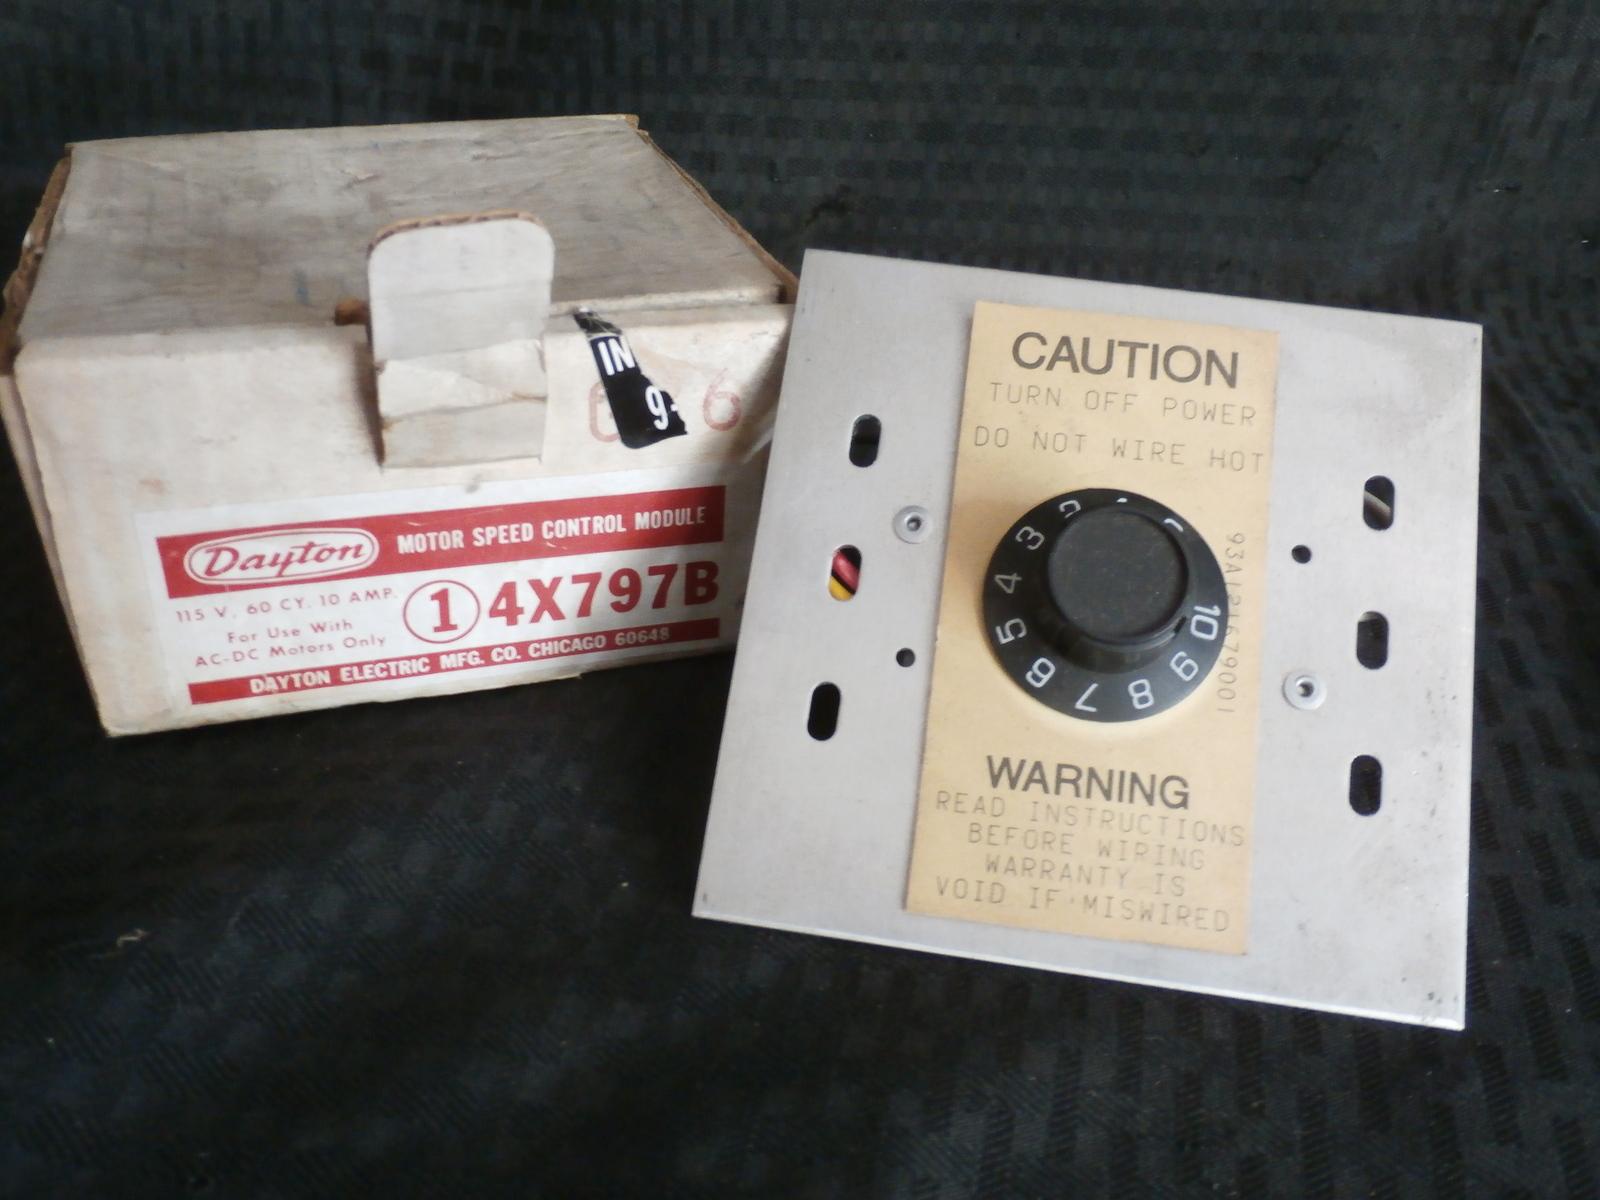 Dayton 4x797b Motor Speed Control Other